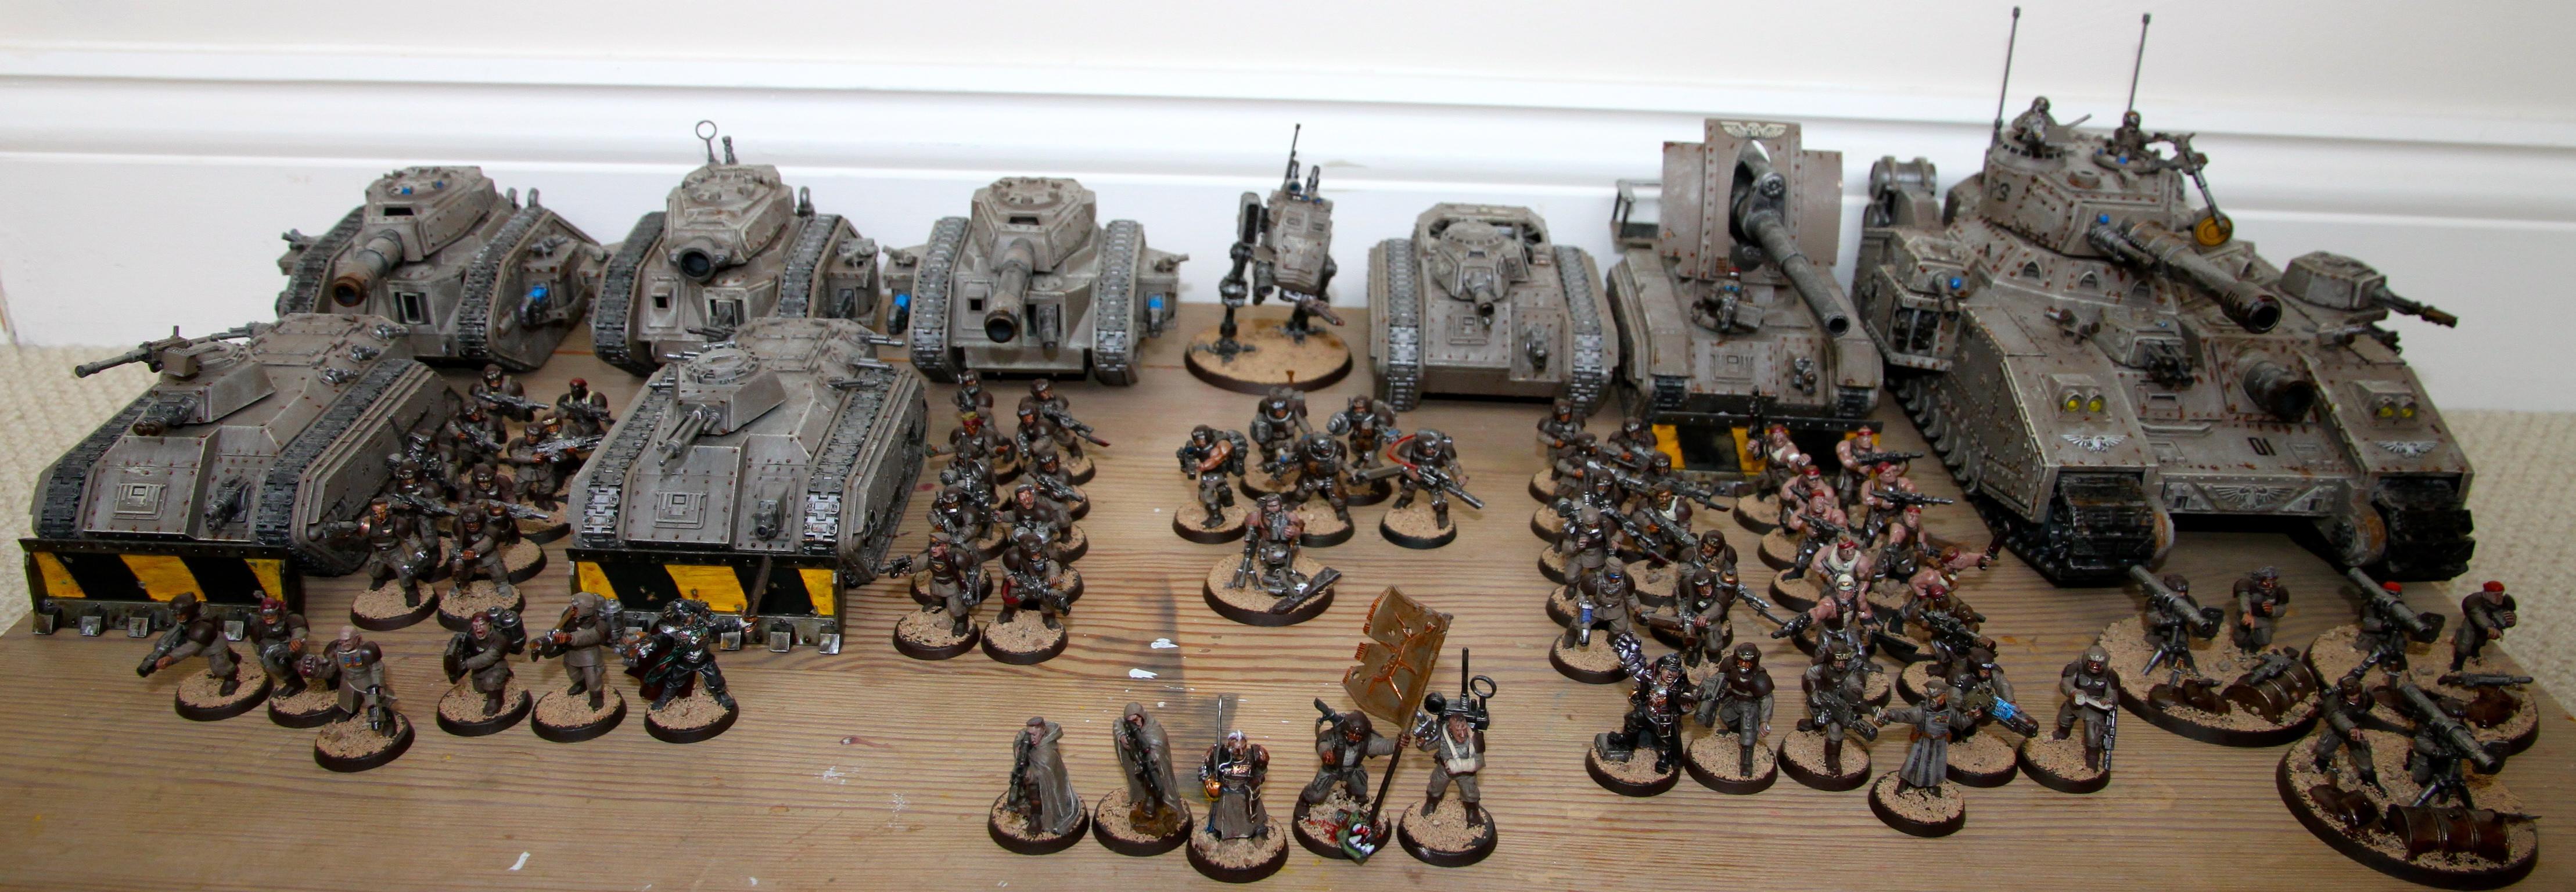 Armored Company, Baneblade, Basilisk, Chimera, Demolisher, Full Army, Imperial Guard, Leman Russ, Sentinel